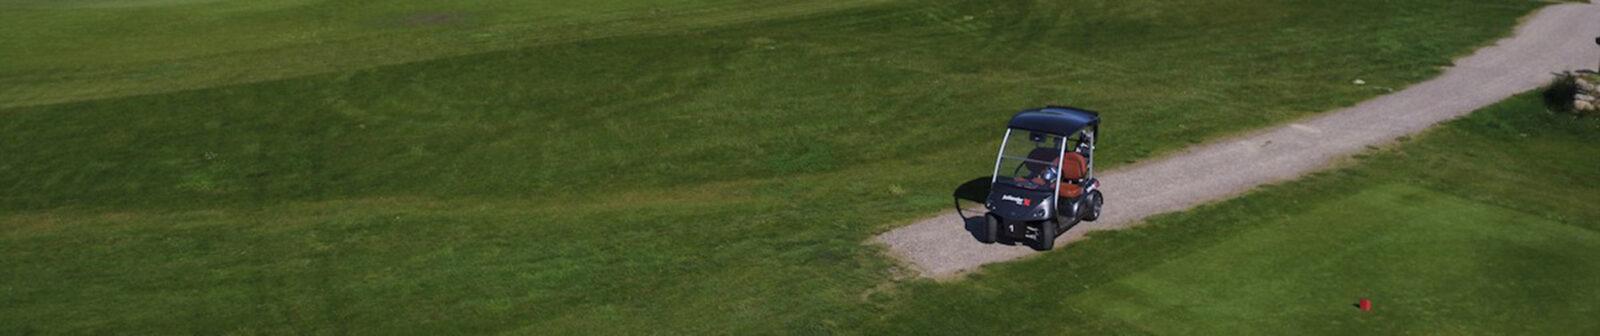 slide_golfbil2